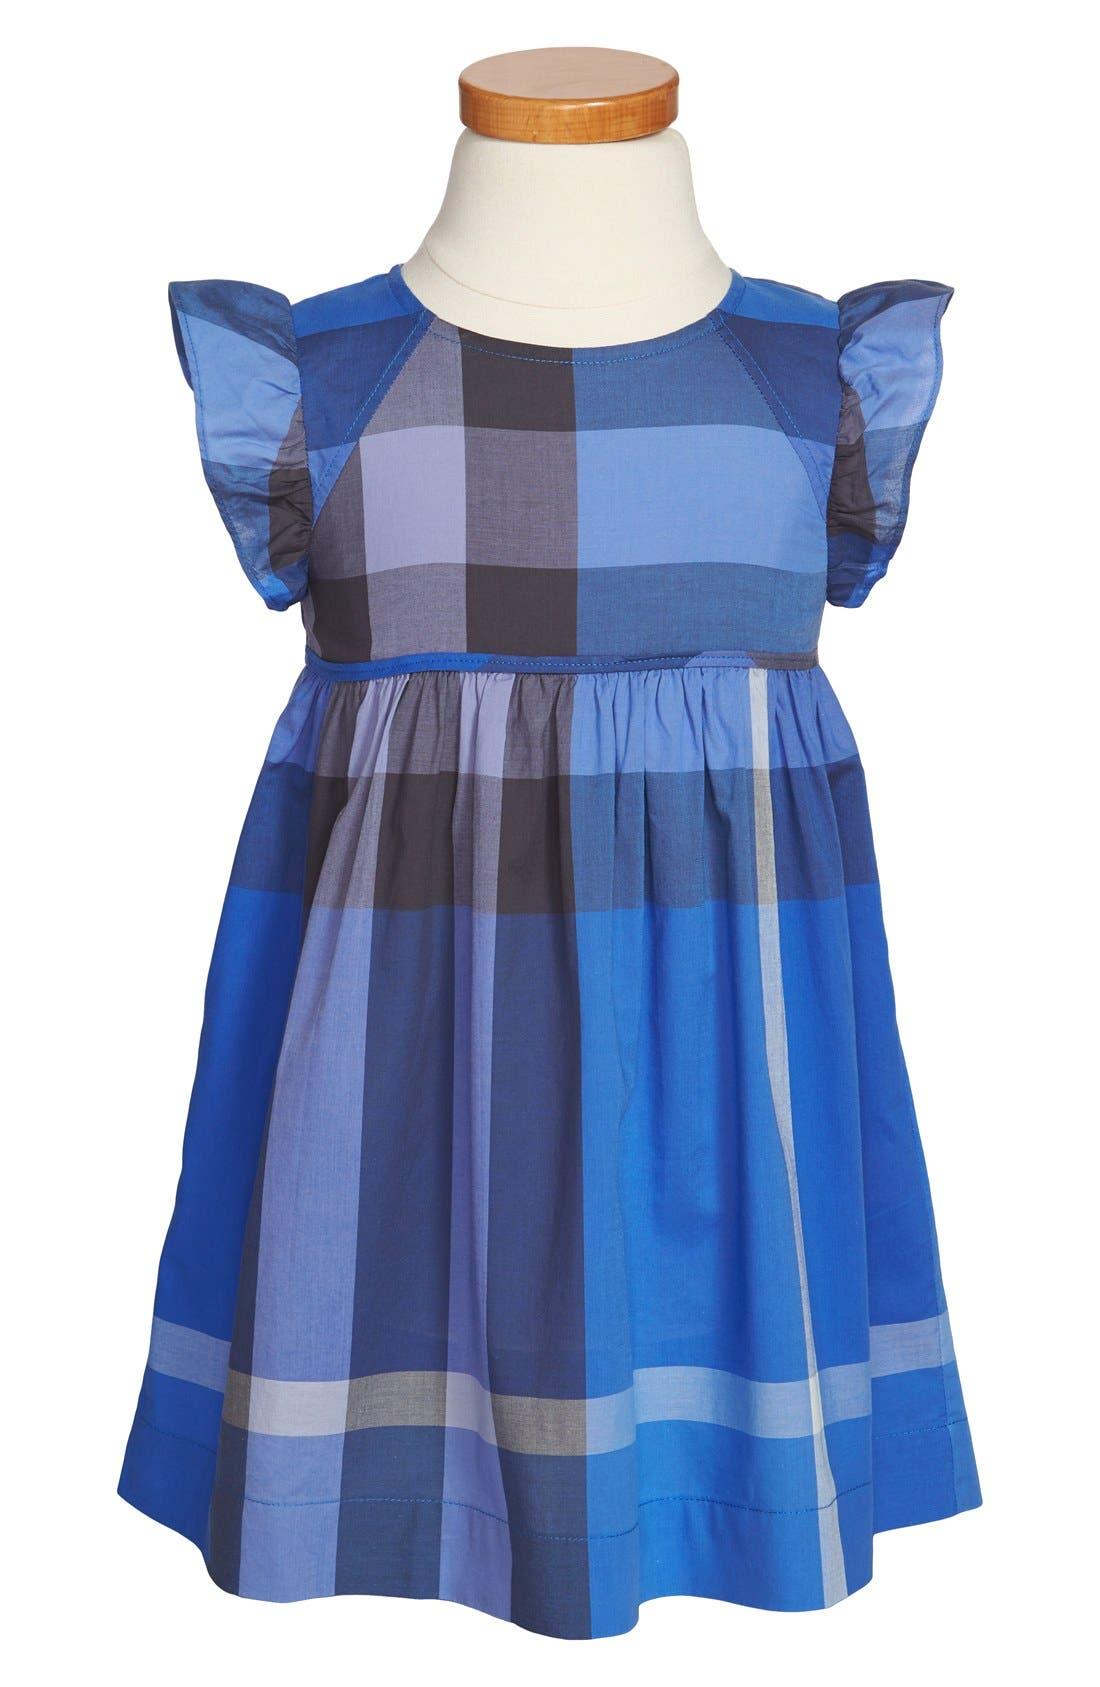 Main Image - Burberry Flutter Sleeve Dress (Toddler Girls)